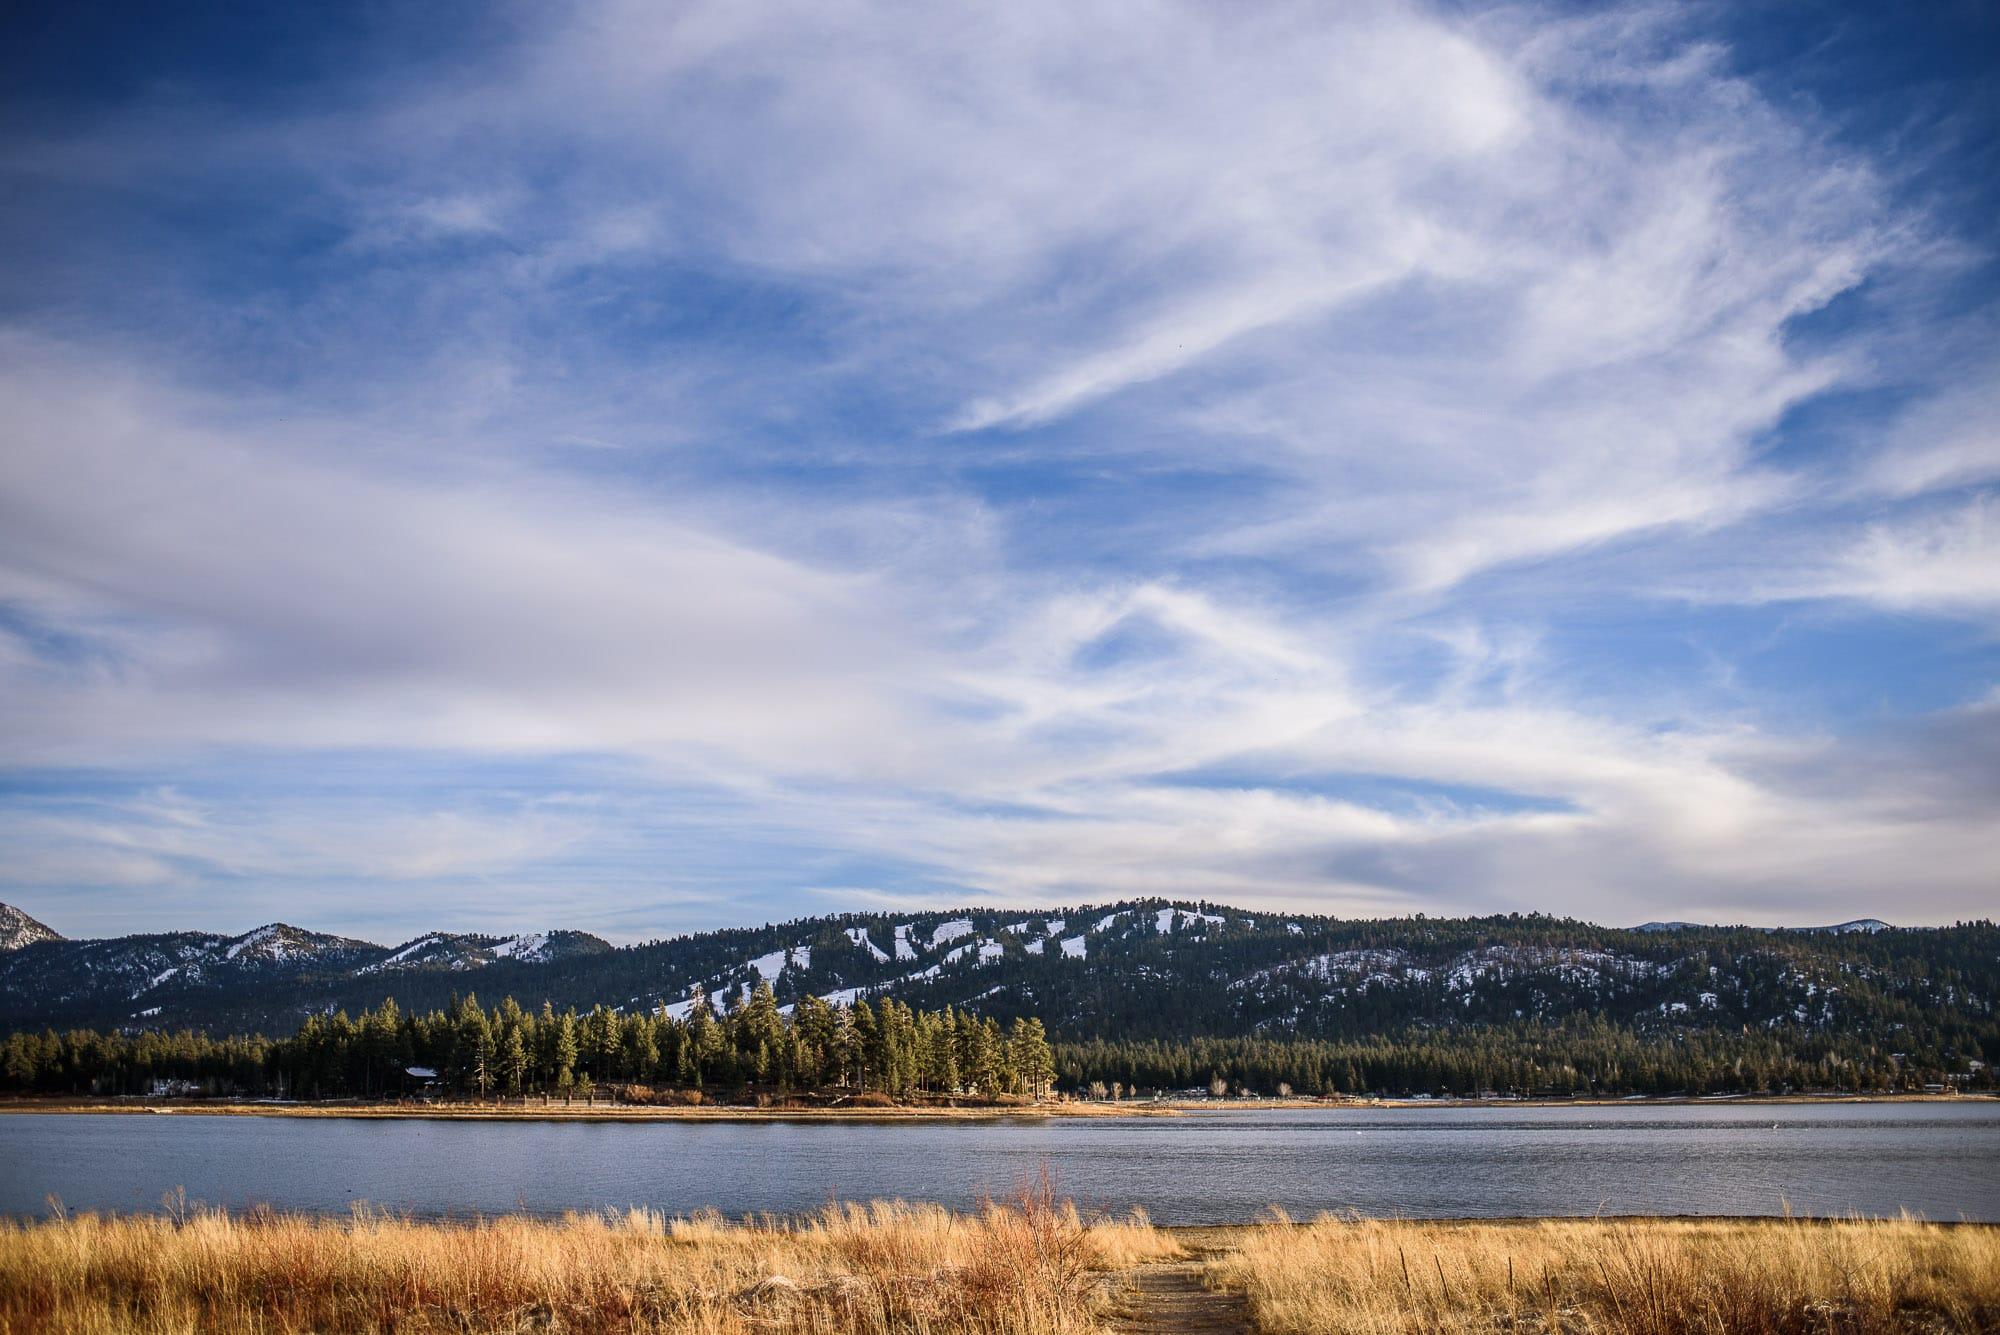 006_Alan_and_Heidi_Big_Bear_Lake_Elopement_Winter